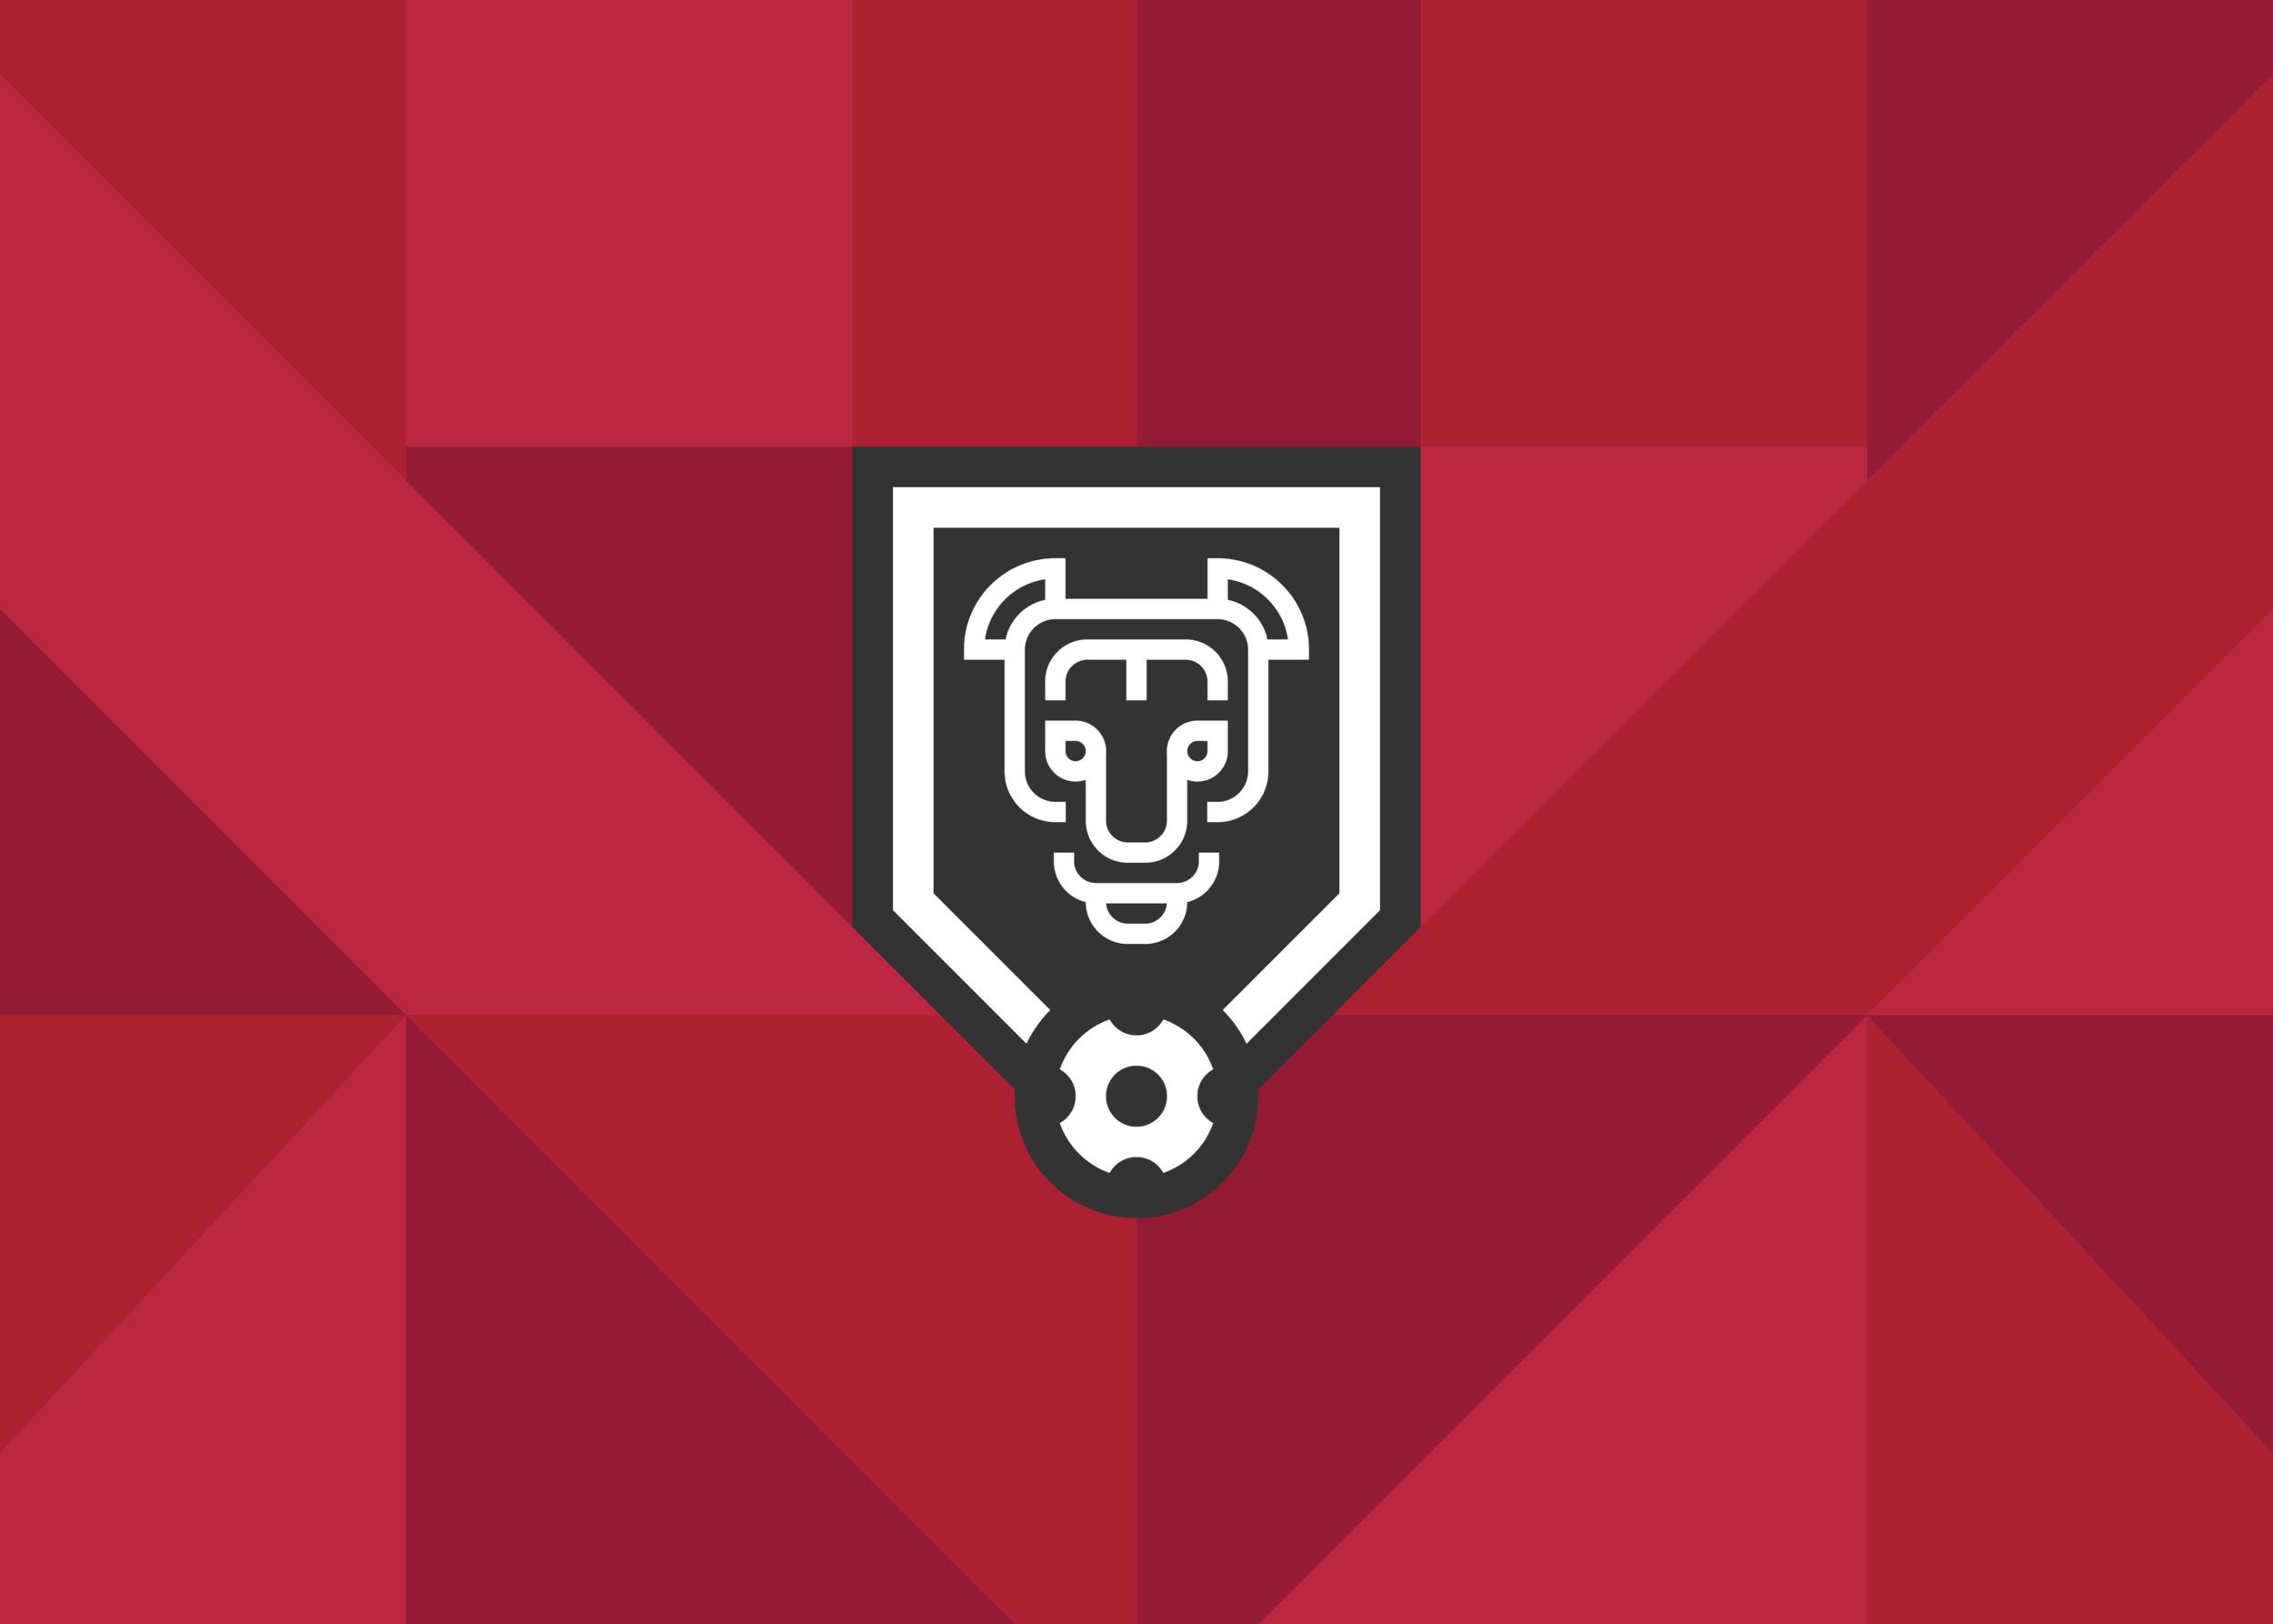 Korea-Geometric-World-Cup-Football-Badge-01-Logo-Design-Freelance-Kent.png